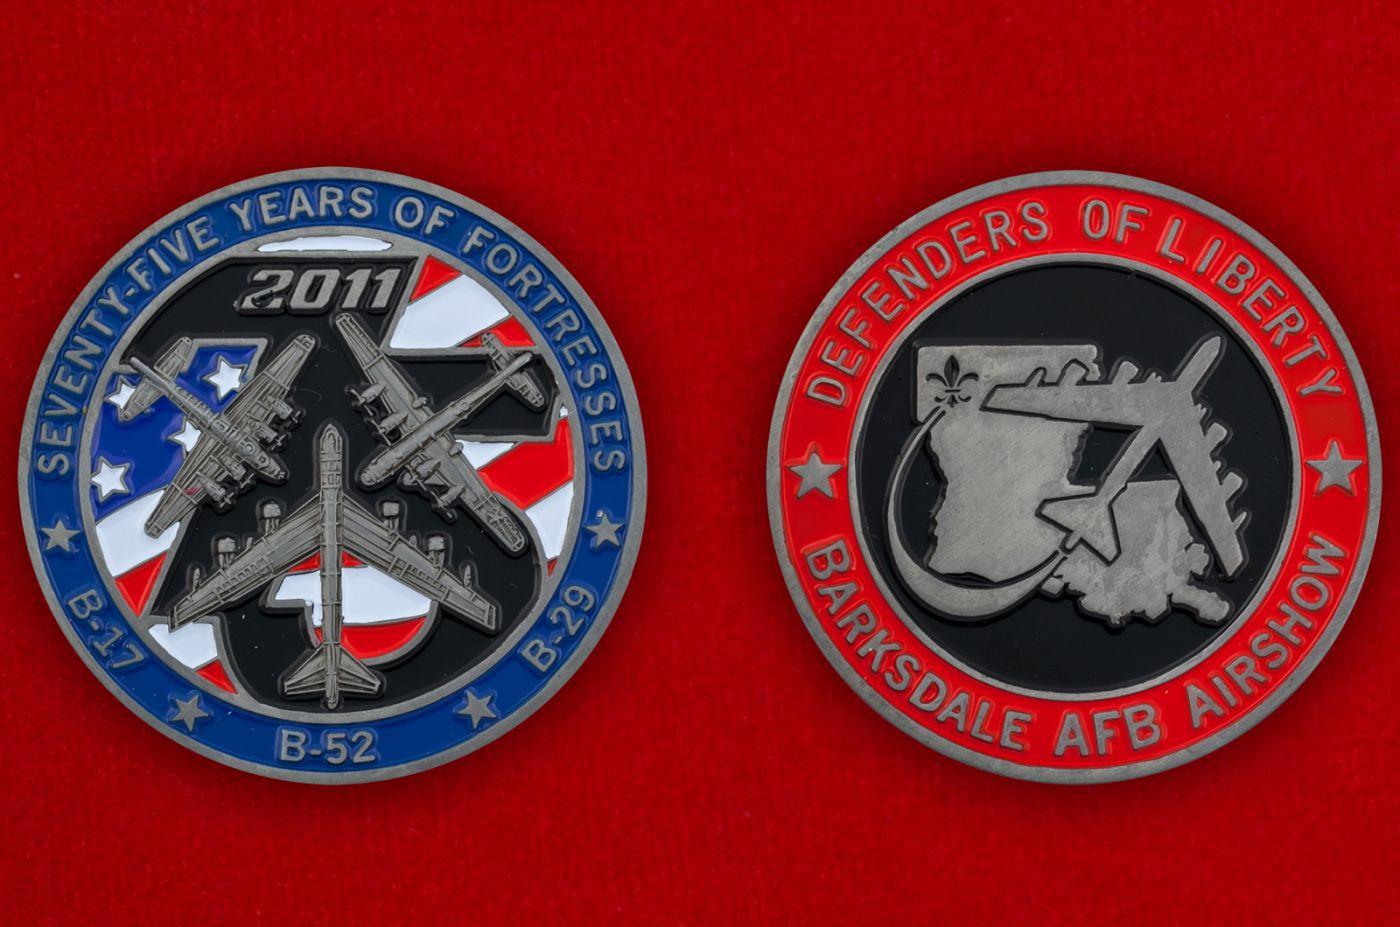 Челлендж коин авиашоу на базе Барксдейл ВВС США - аверс и реверс